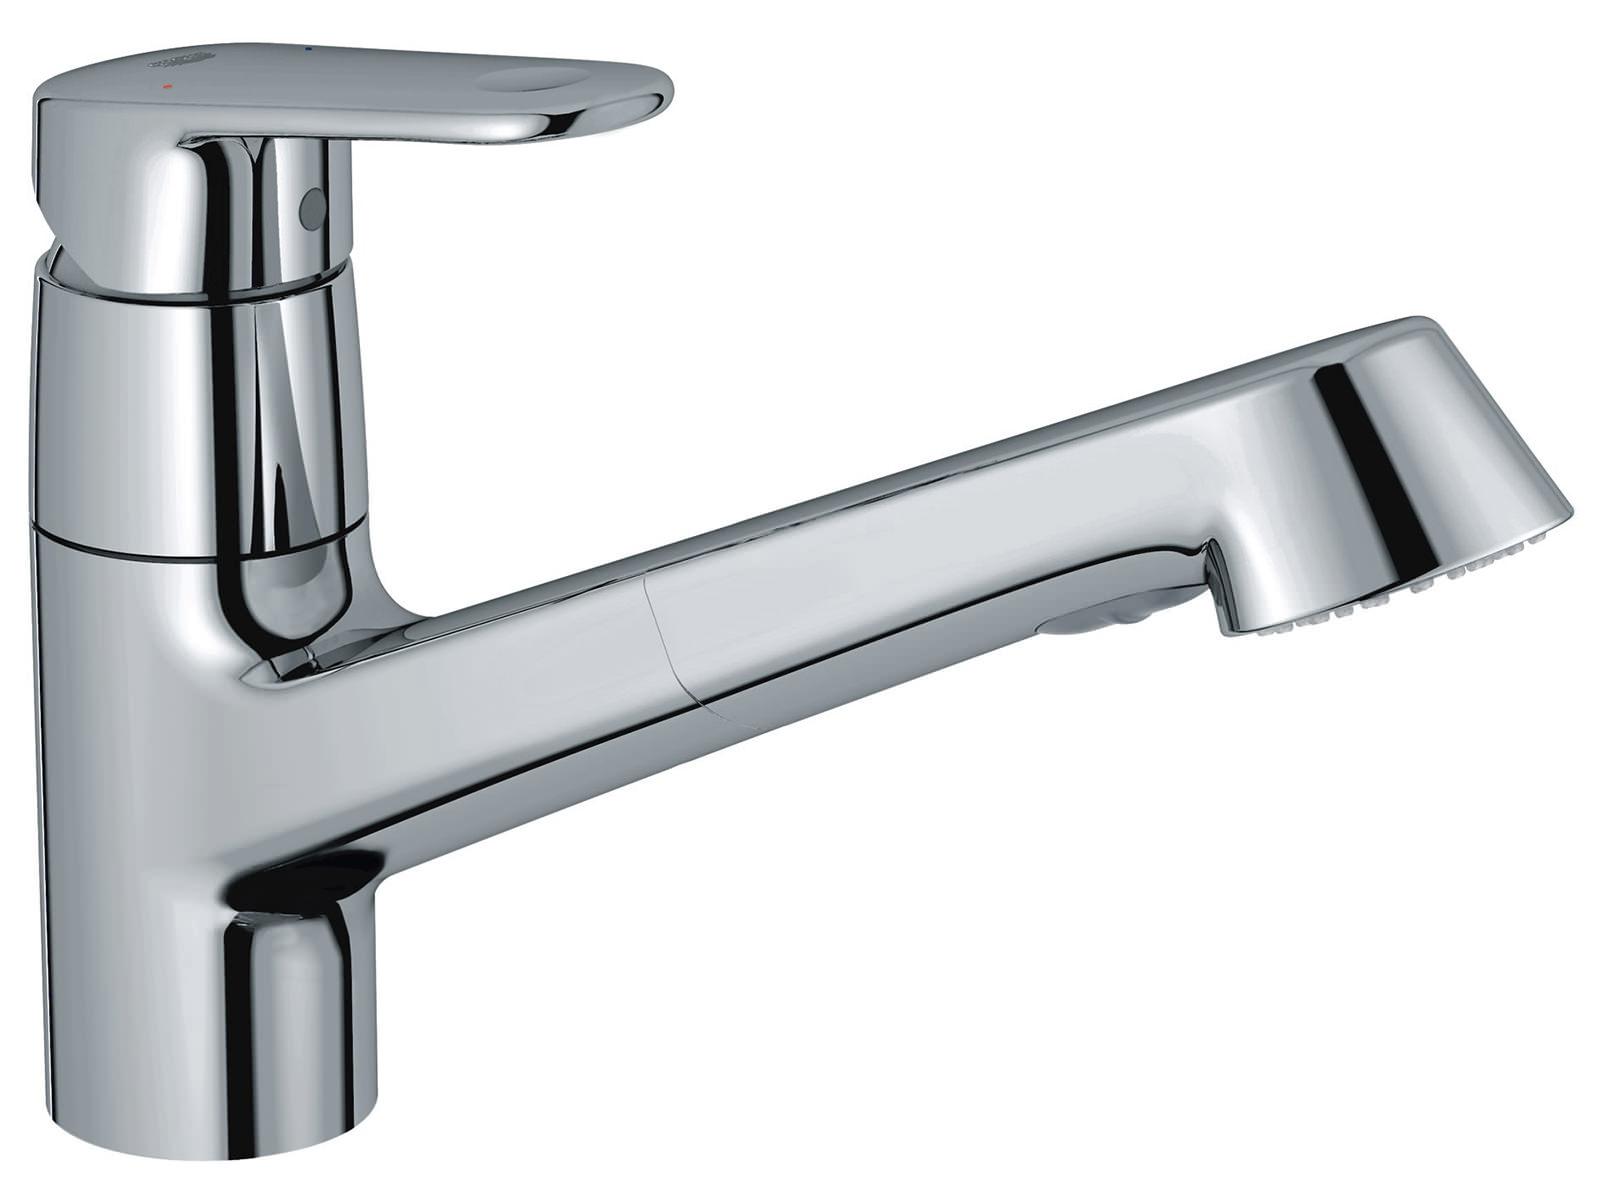 grohe europlus chrome low spout sink mixer tap 32942002. Black Bedroom Furniture Sets. Home Design Ideas